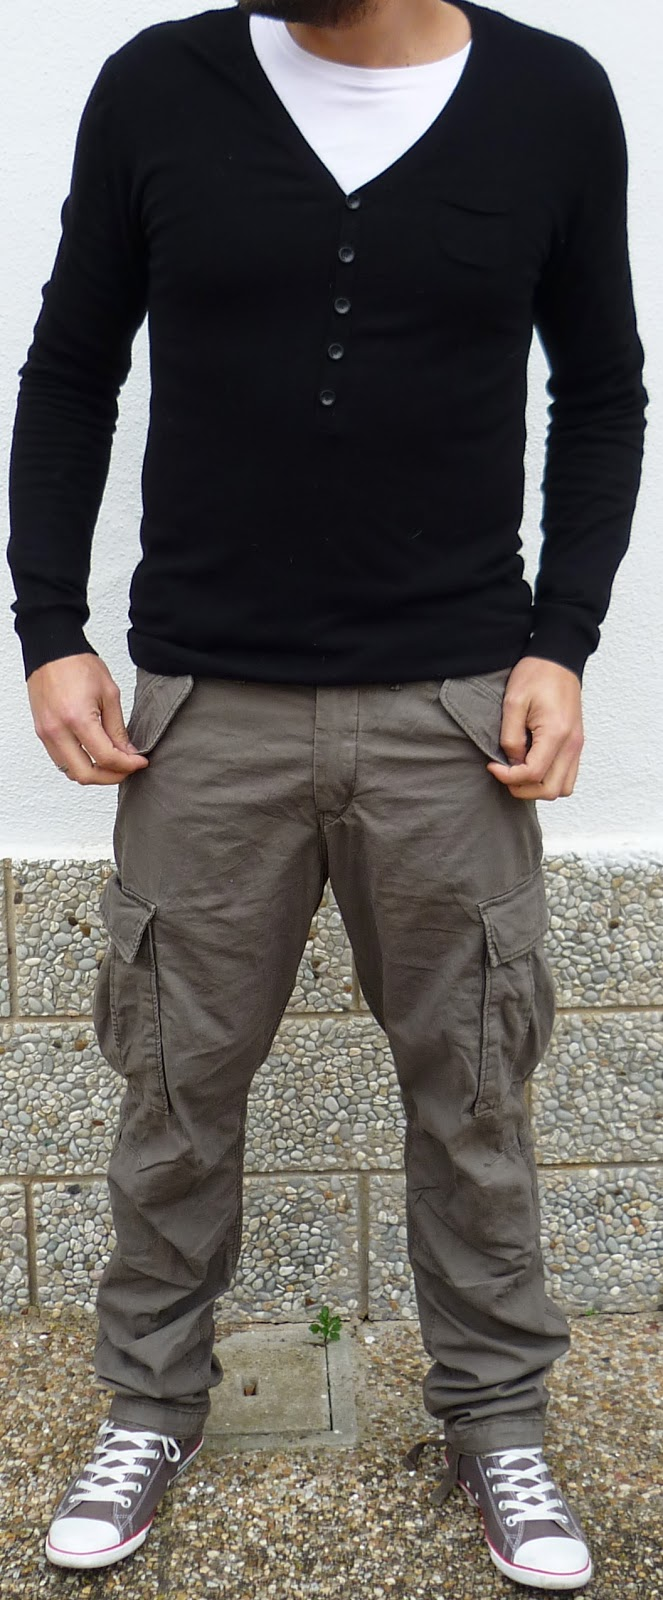 pantalón militar bolsillos